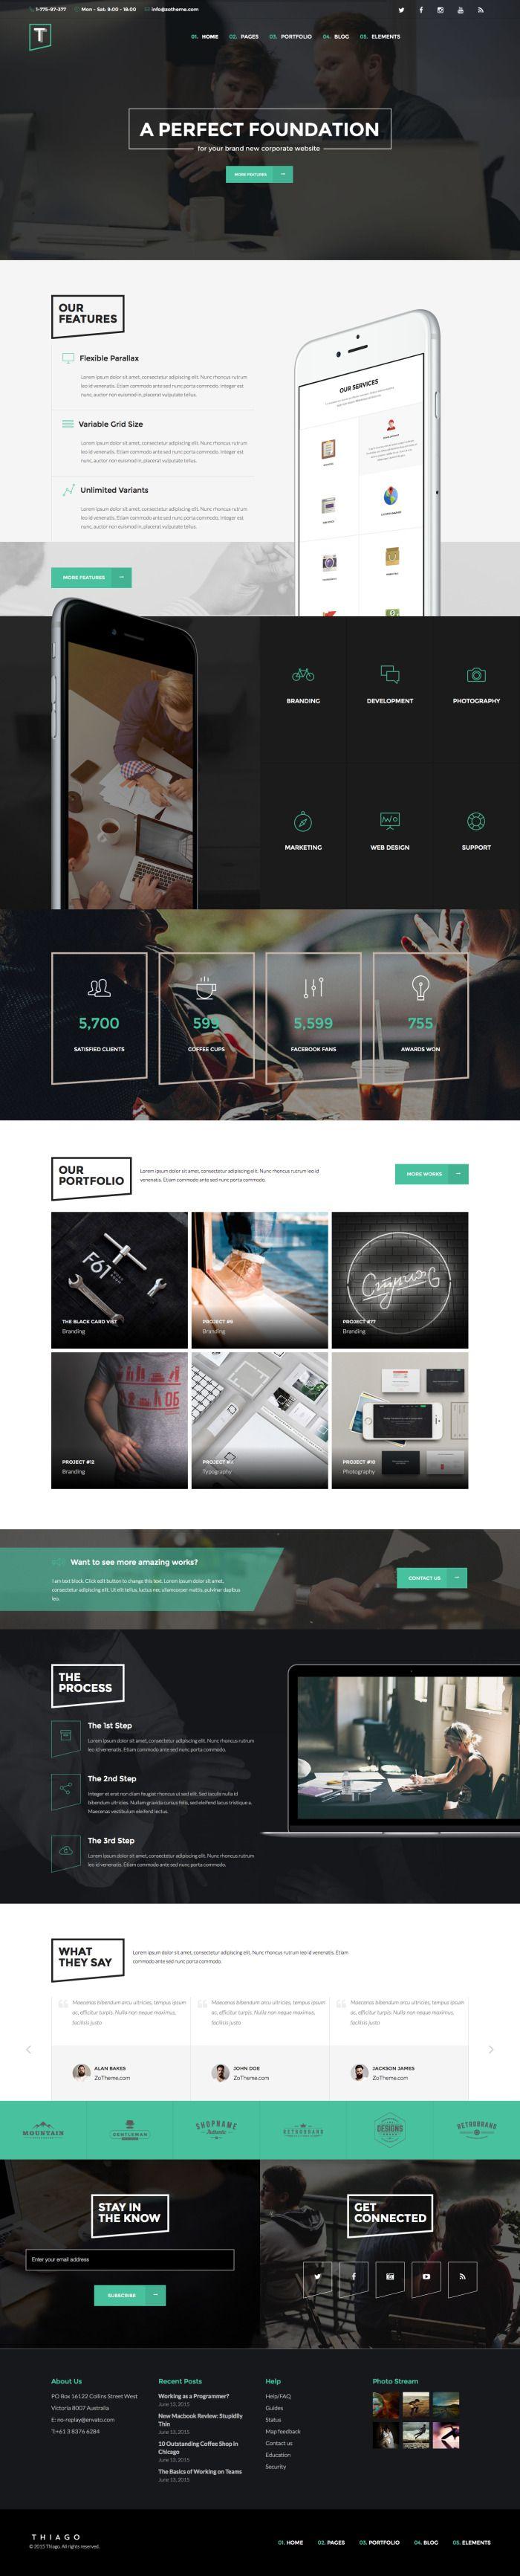 Thiago - Responsive Multi-Purpose WordPress Theme